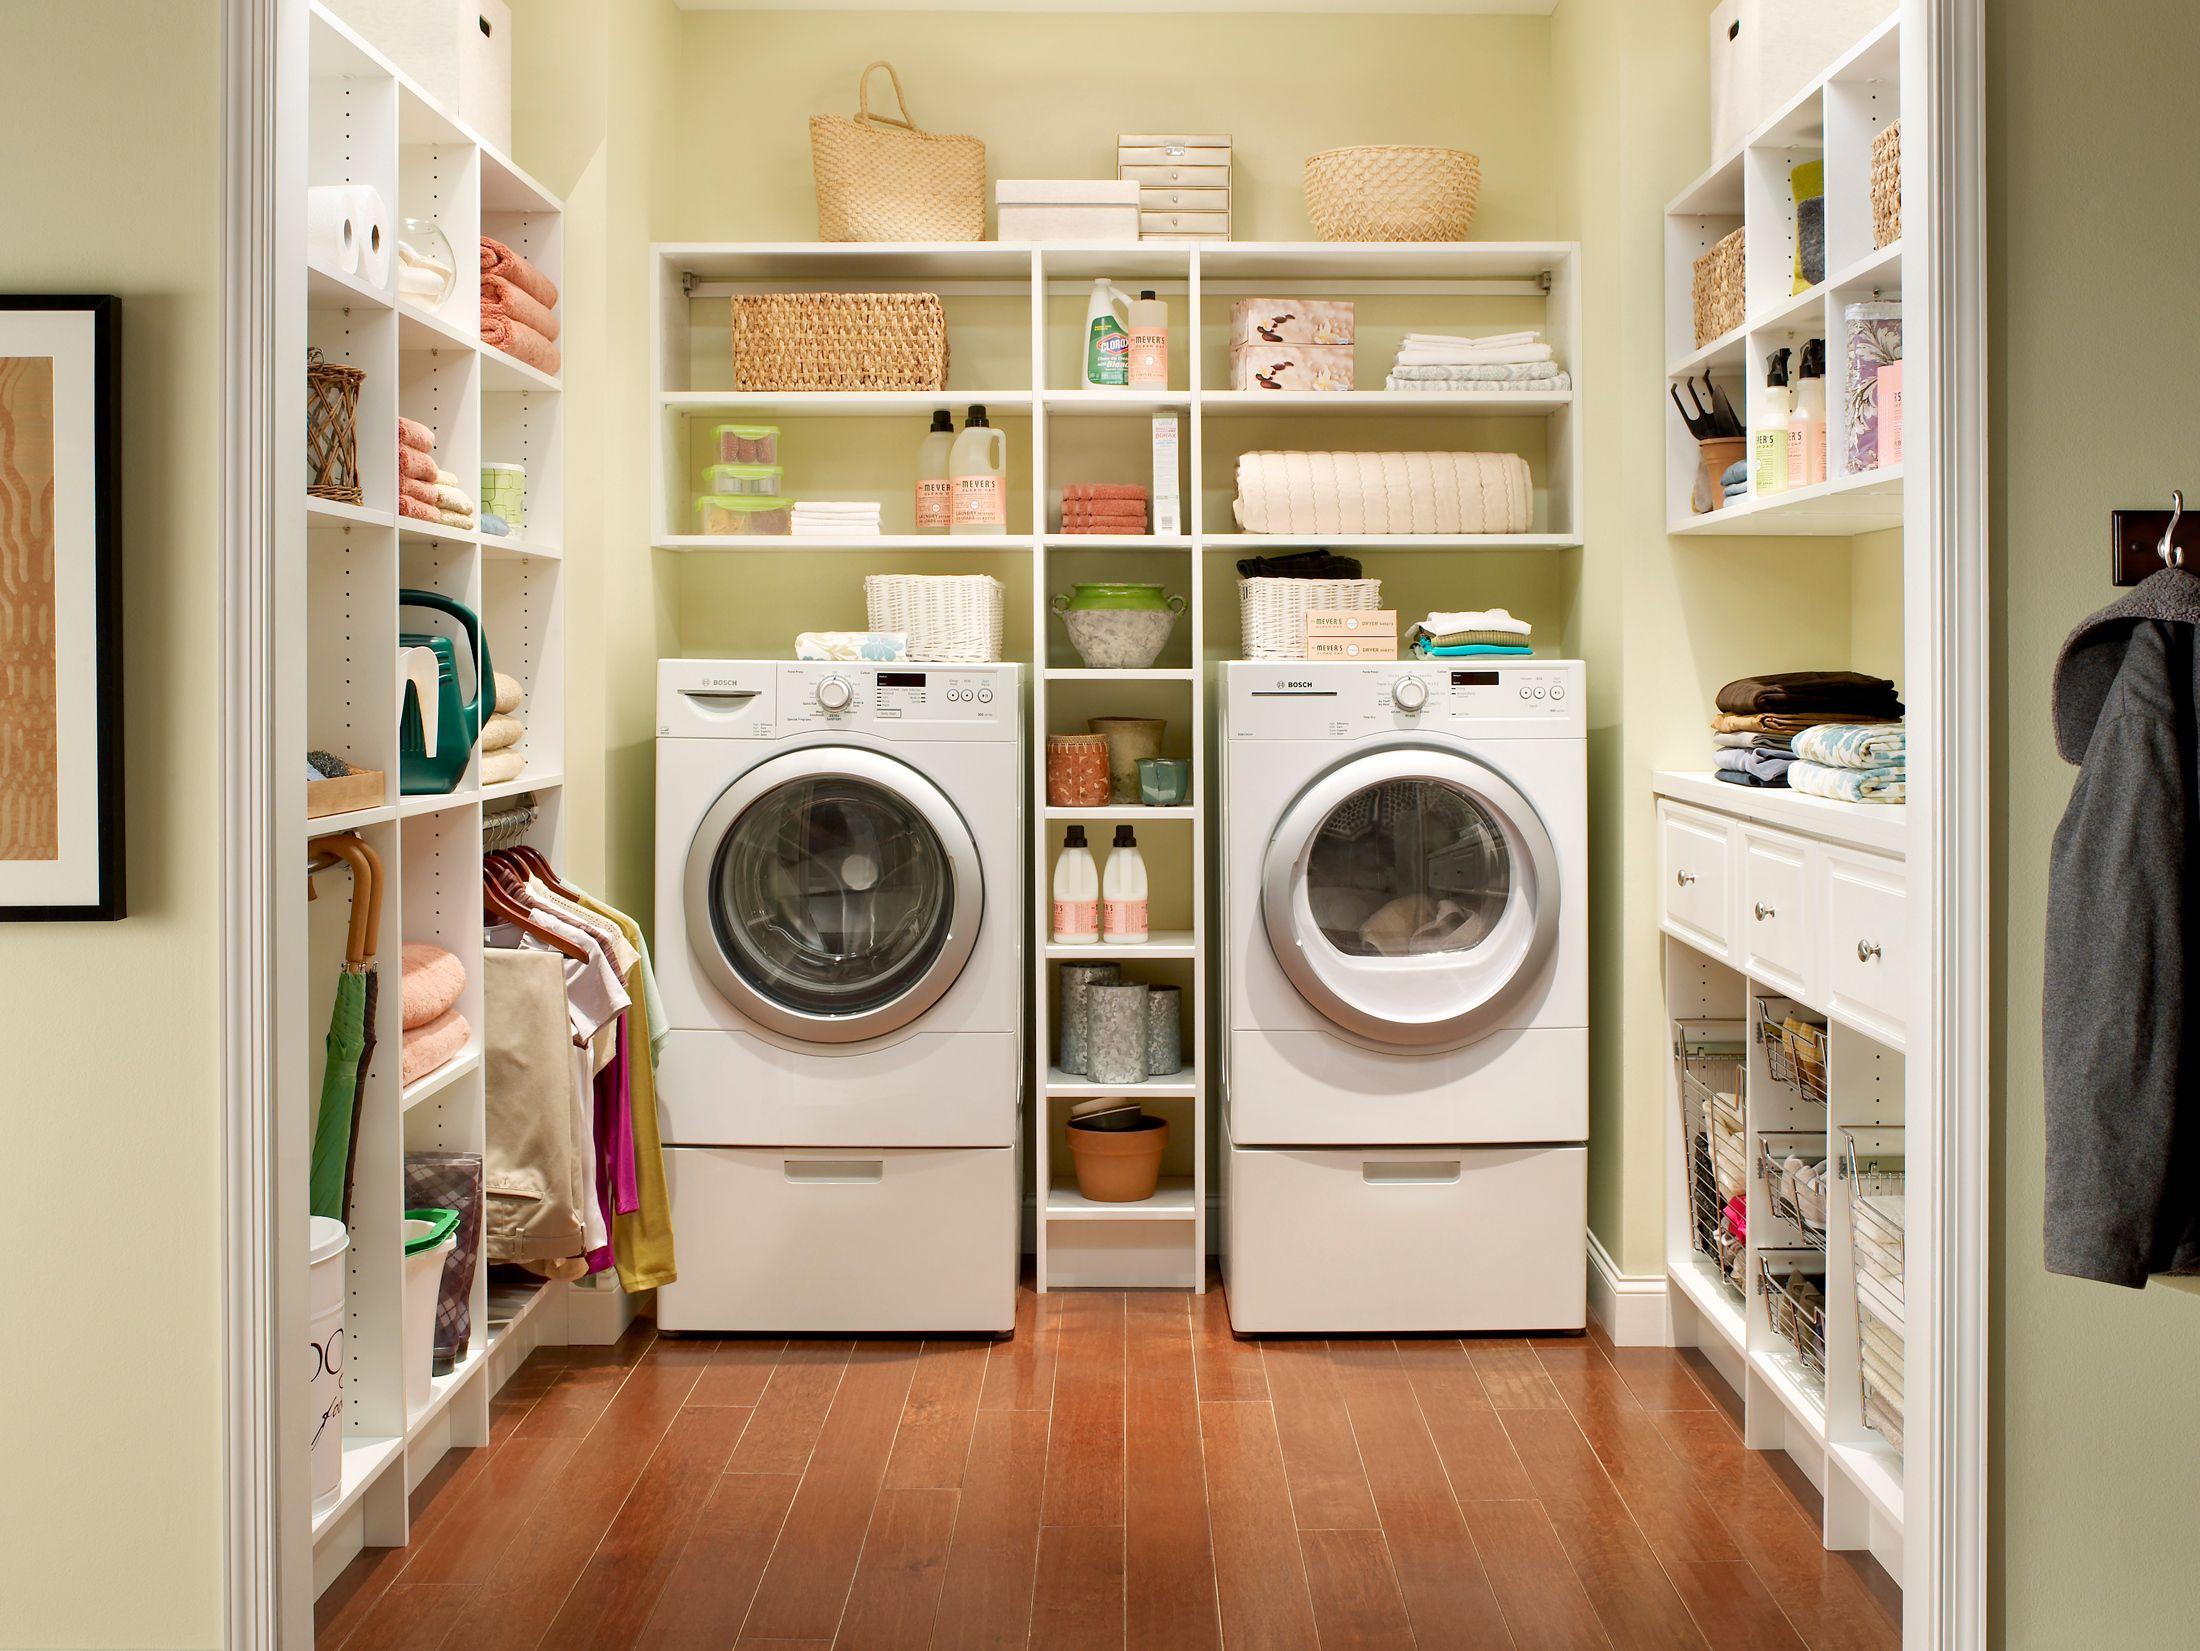 Mastersuite Closet Storage System Laundry Room Storage Modern Laundry Rooms Vintage Laundry Room